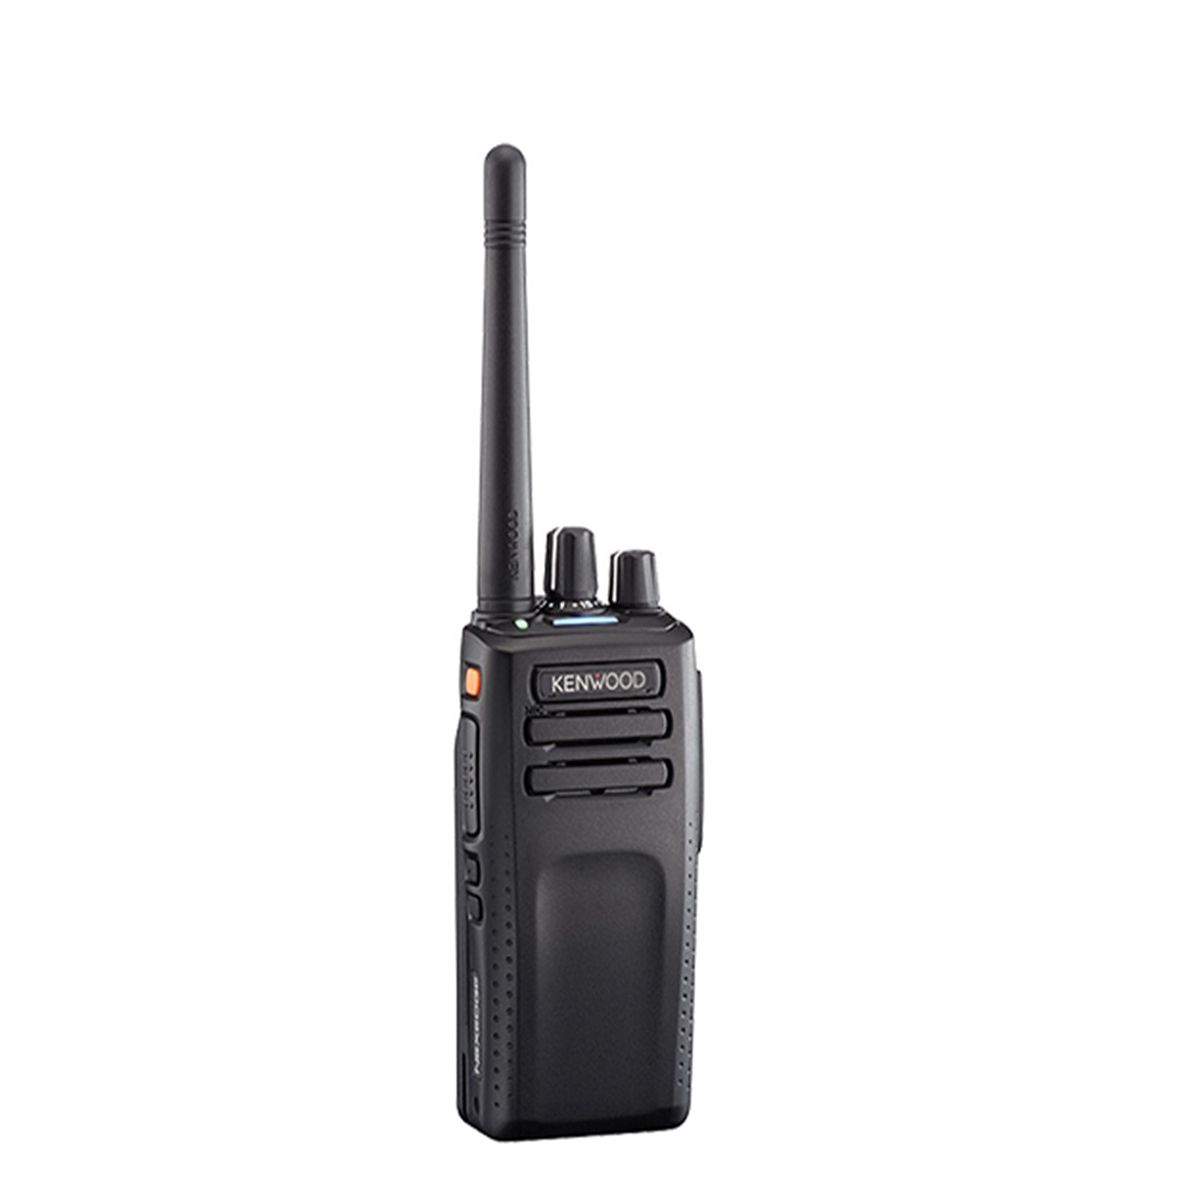 Radio KENWOOD NX-3200 Digital VHF 136-174 MHz sin pantalla y sin teclado